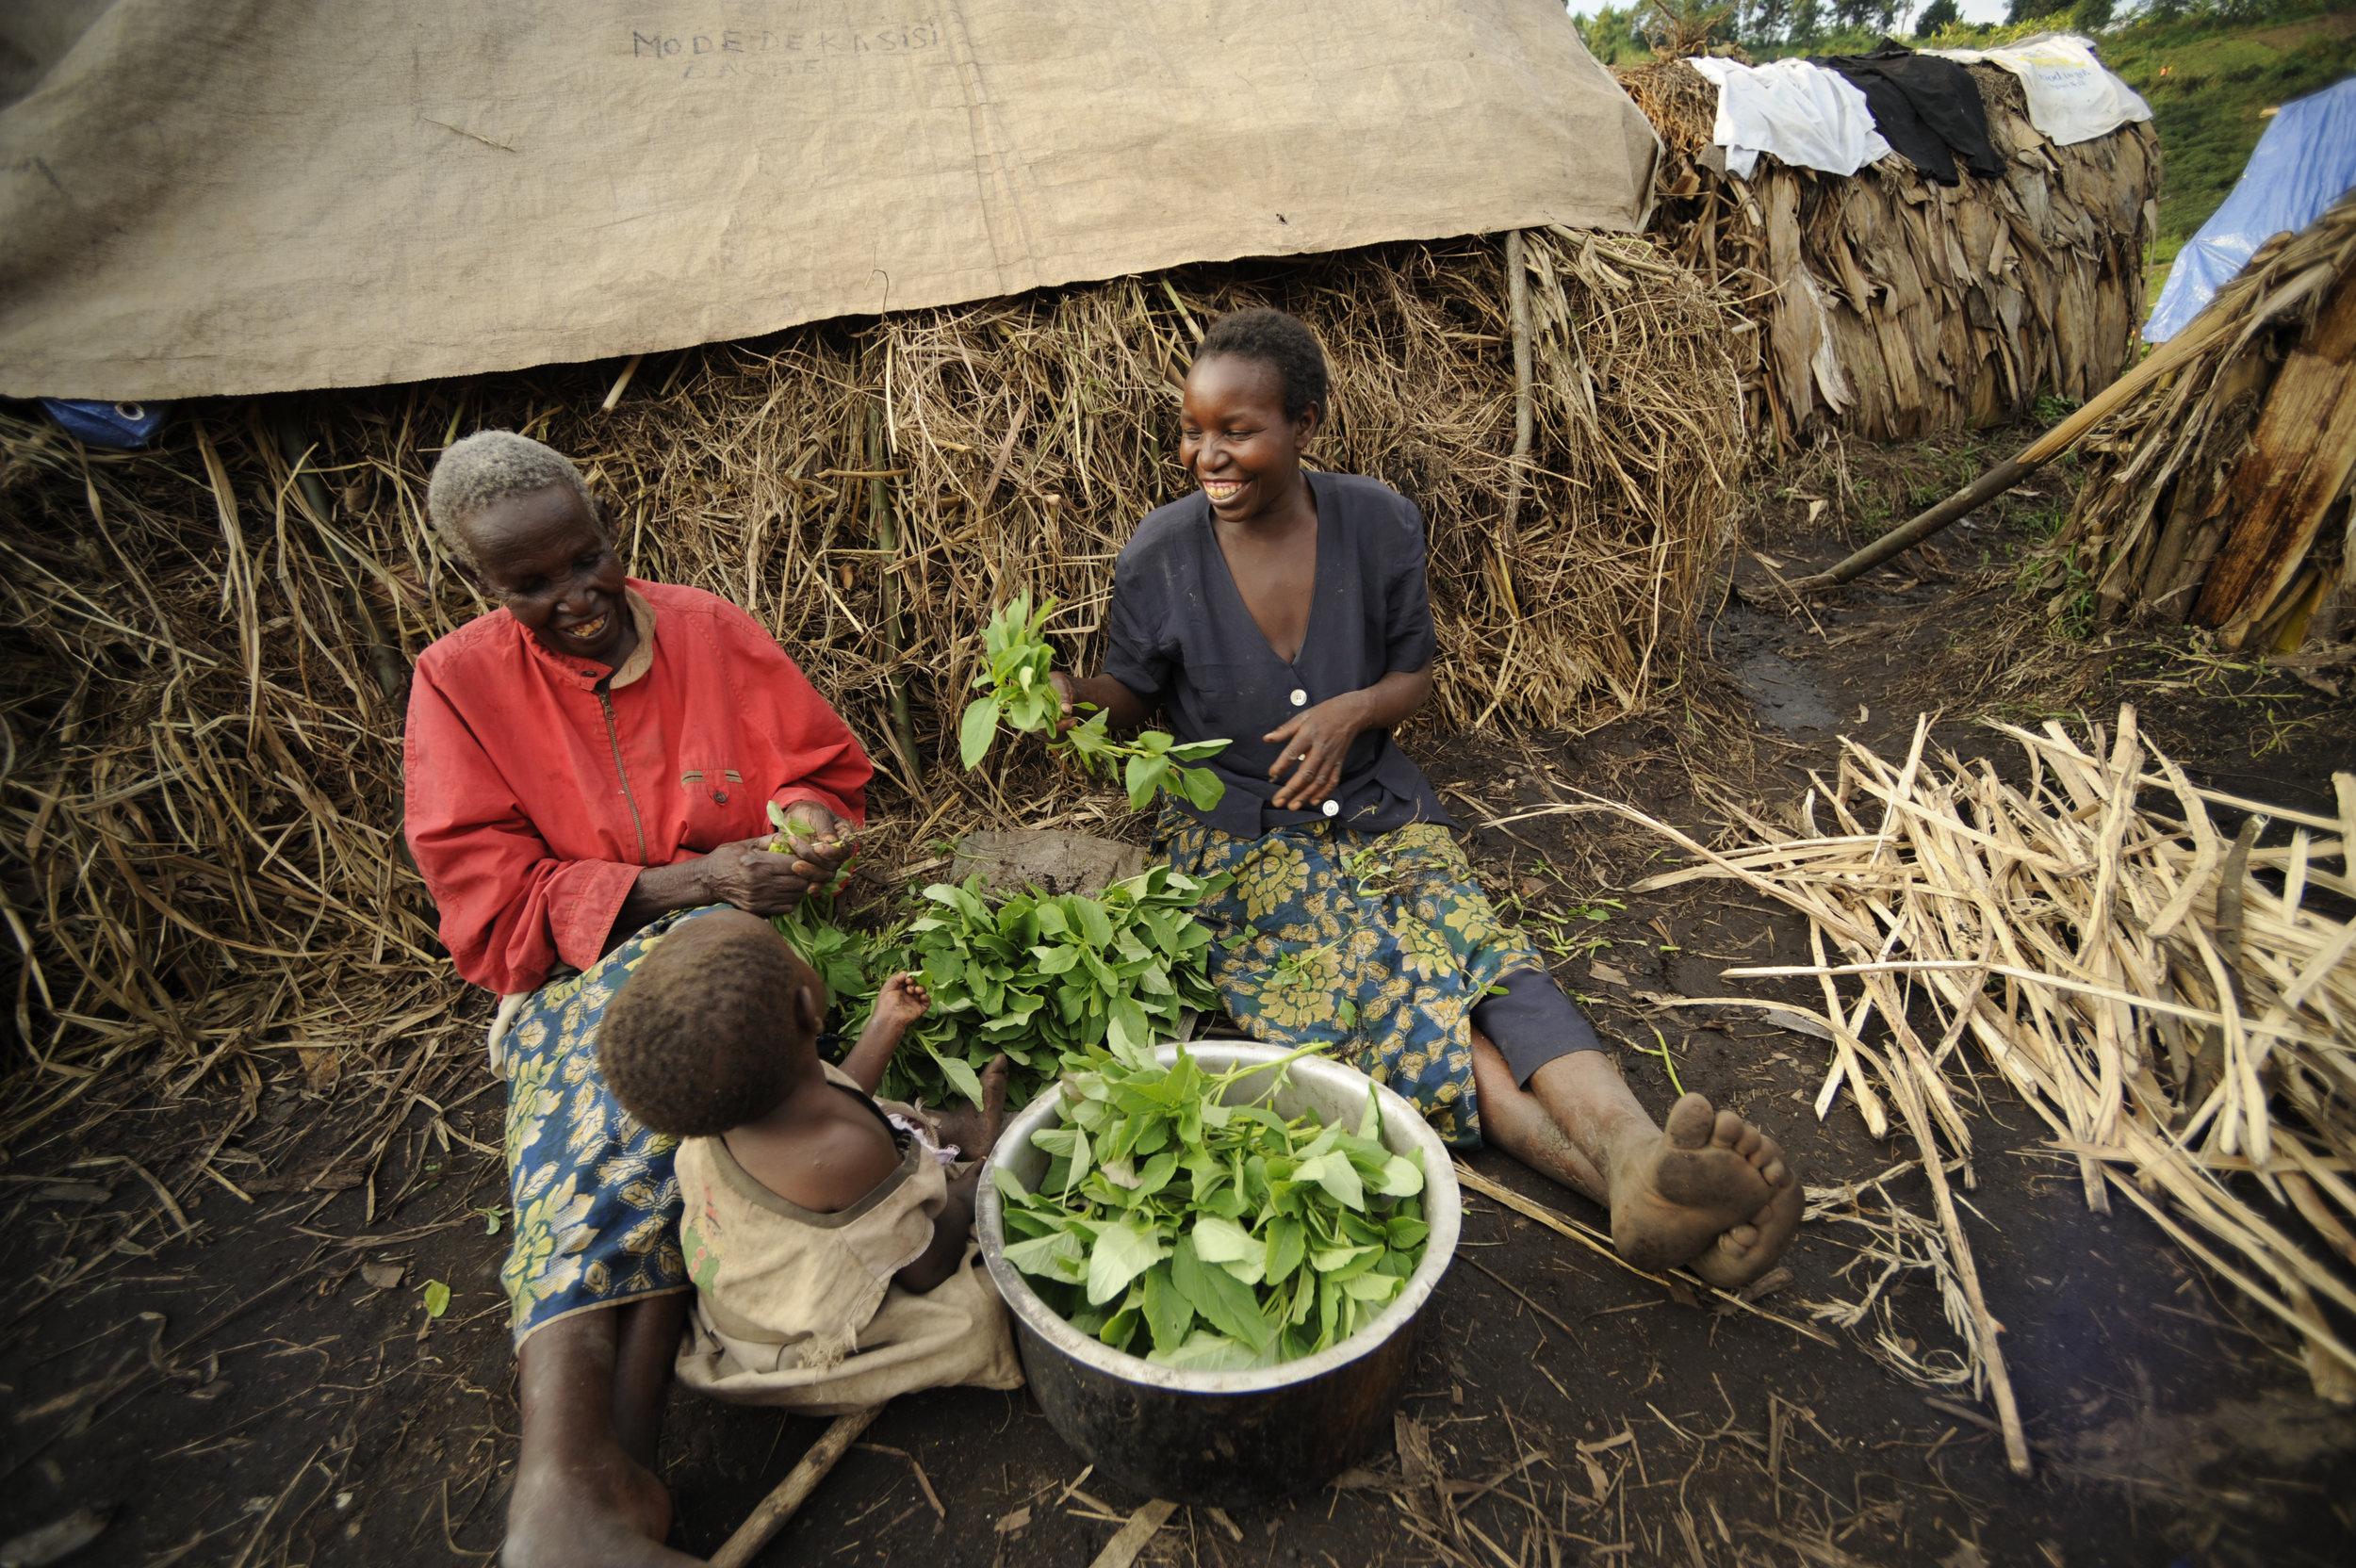 20090205_VVick_Cooking_DRC_VanessaVick022.jpg